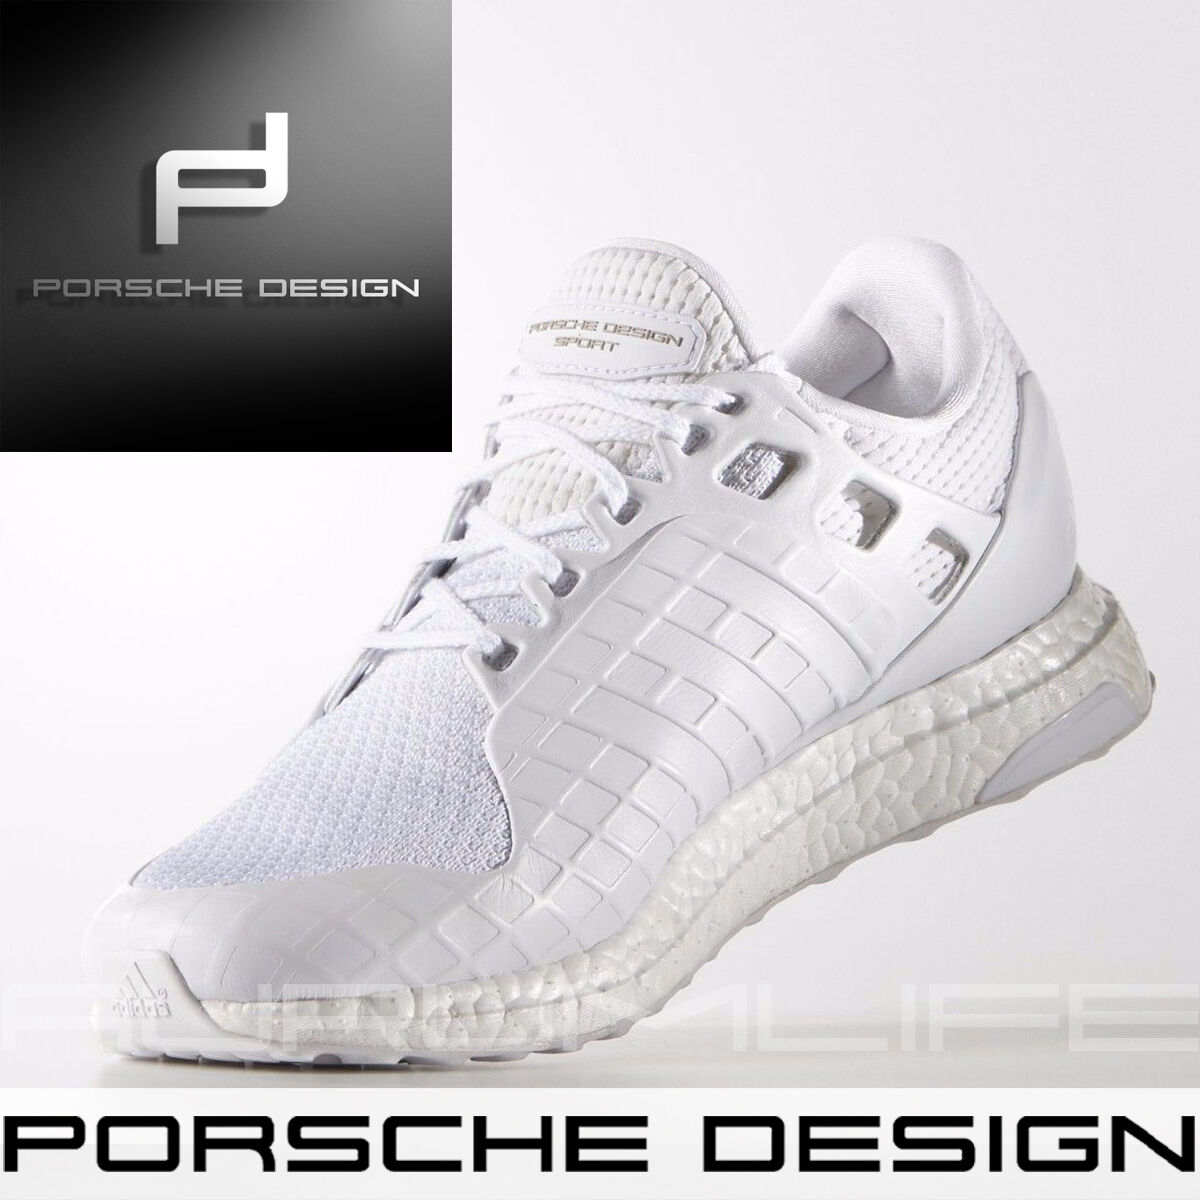 Adidas Porsche Diseño Zapatos Ultra Boost para hombre Sport blanco Talla BB0682 Nuevo